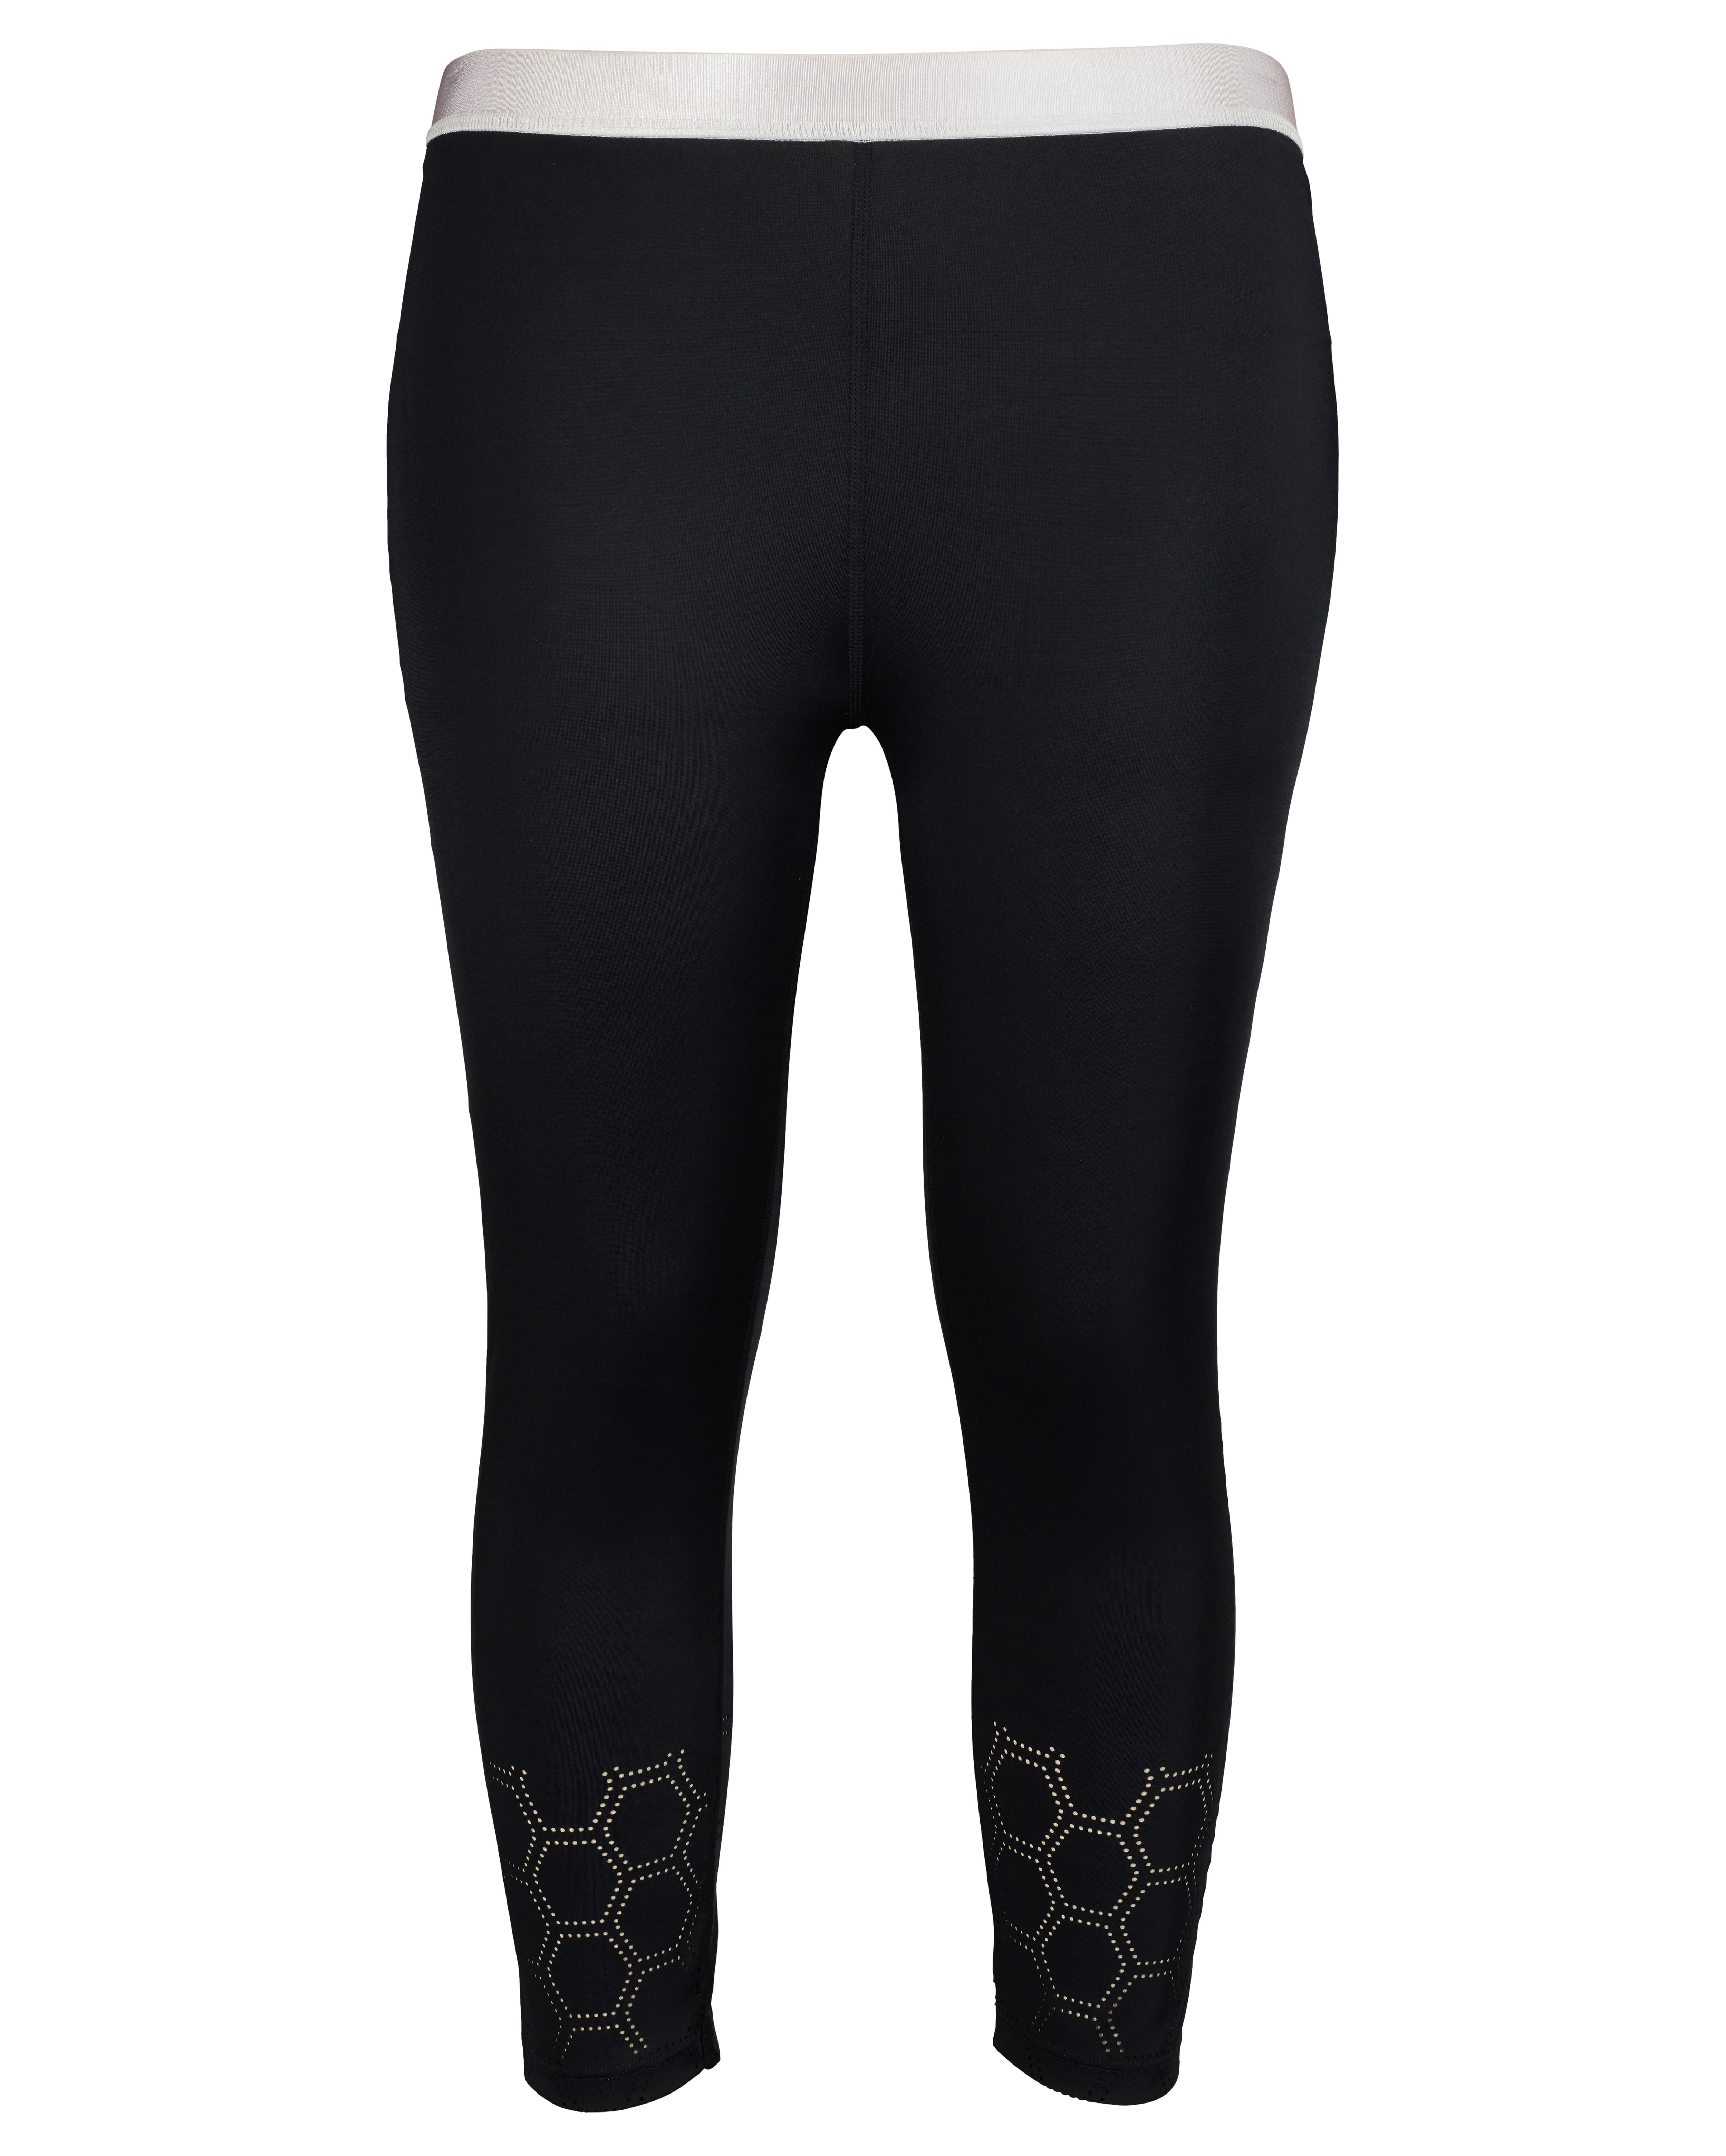 Skiny L. 3/4 Running Tight – Black